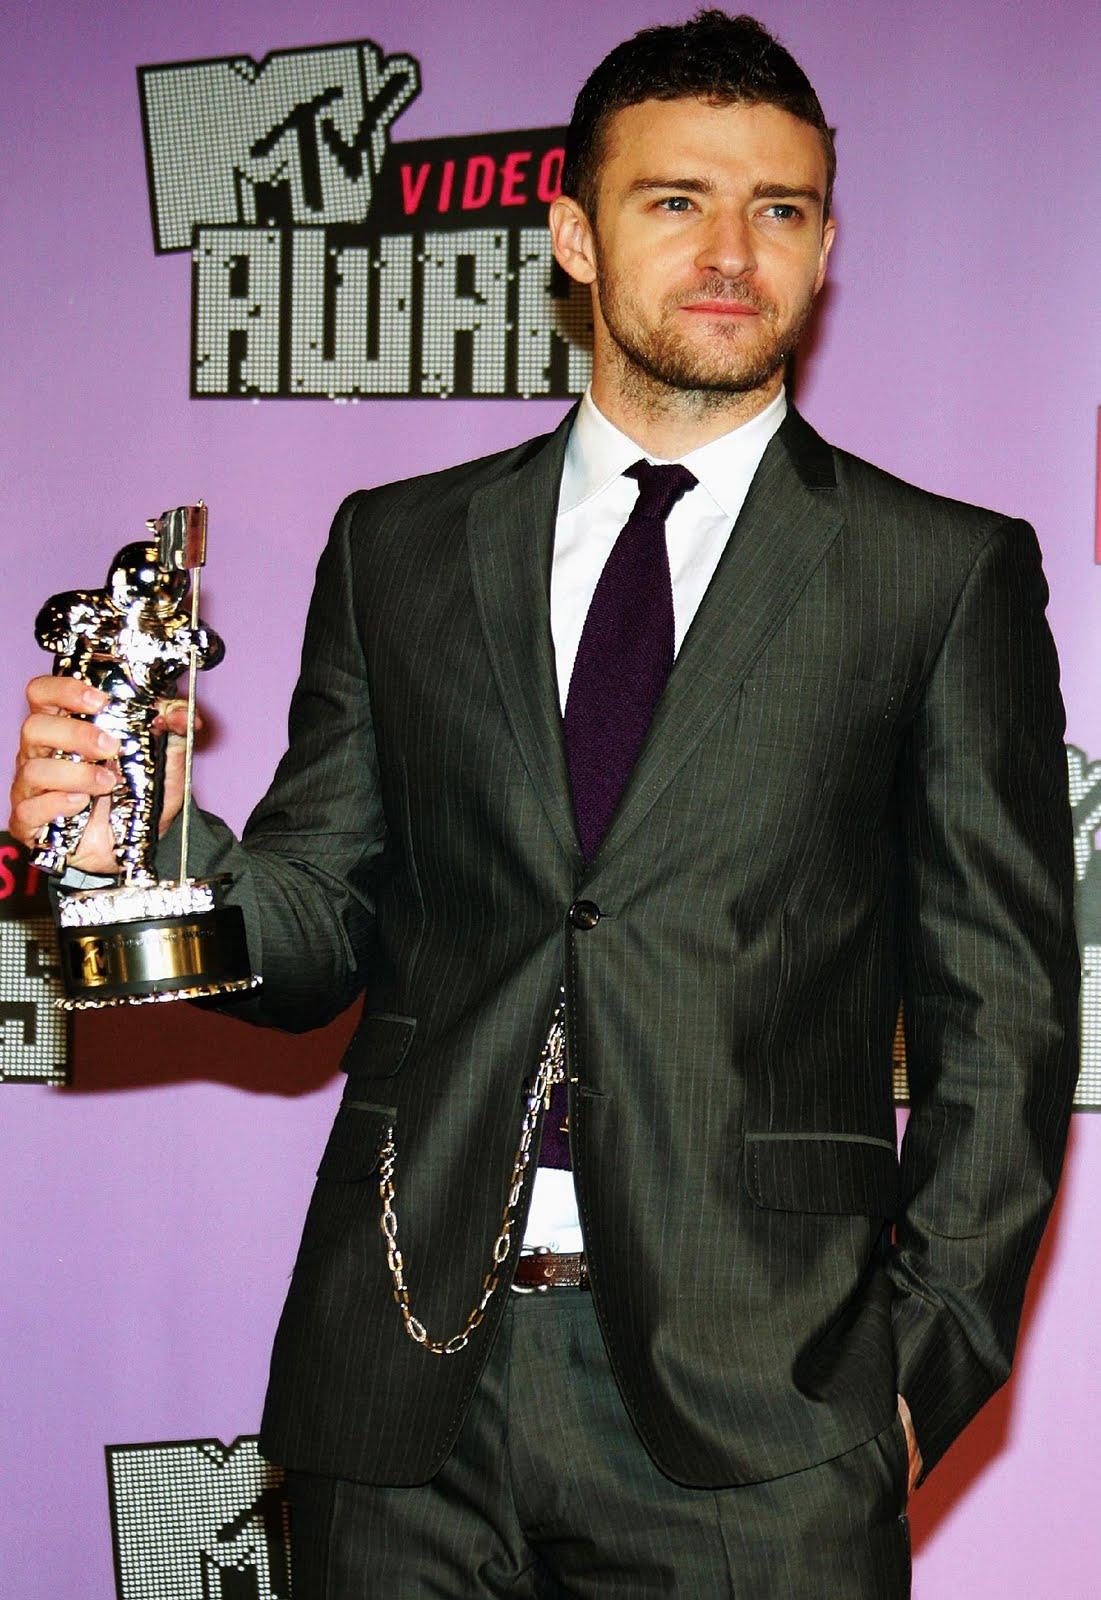 http://2.bp.blogspot.com/-LNZa_qe9cCM/TfLPnjctRII/AAAAAAAAAKs/IT5VSKGxOlo/s1600/Justin-Timberlake-photo-003.jpg